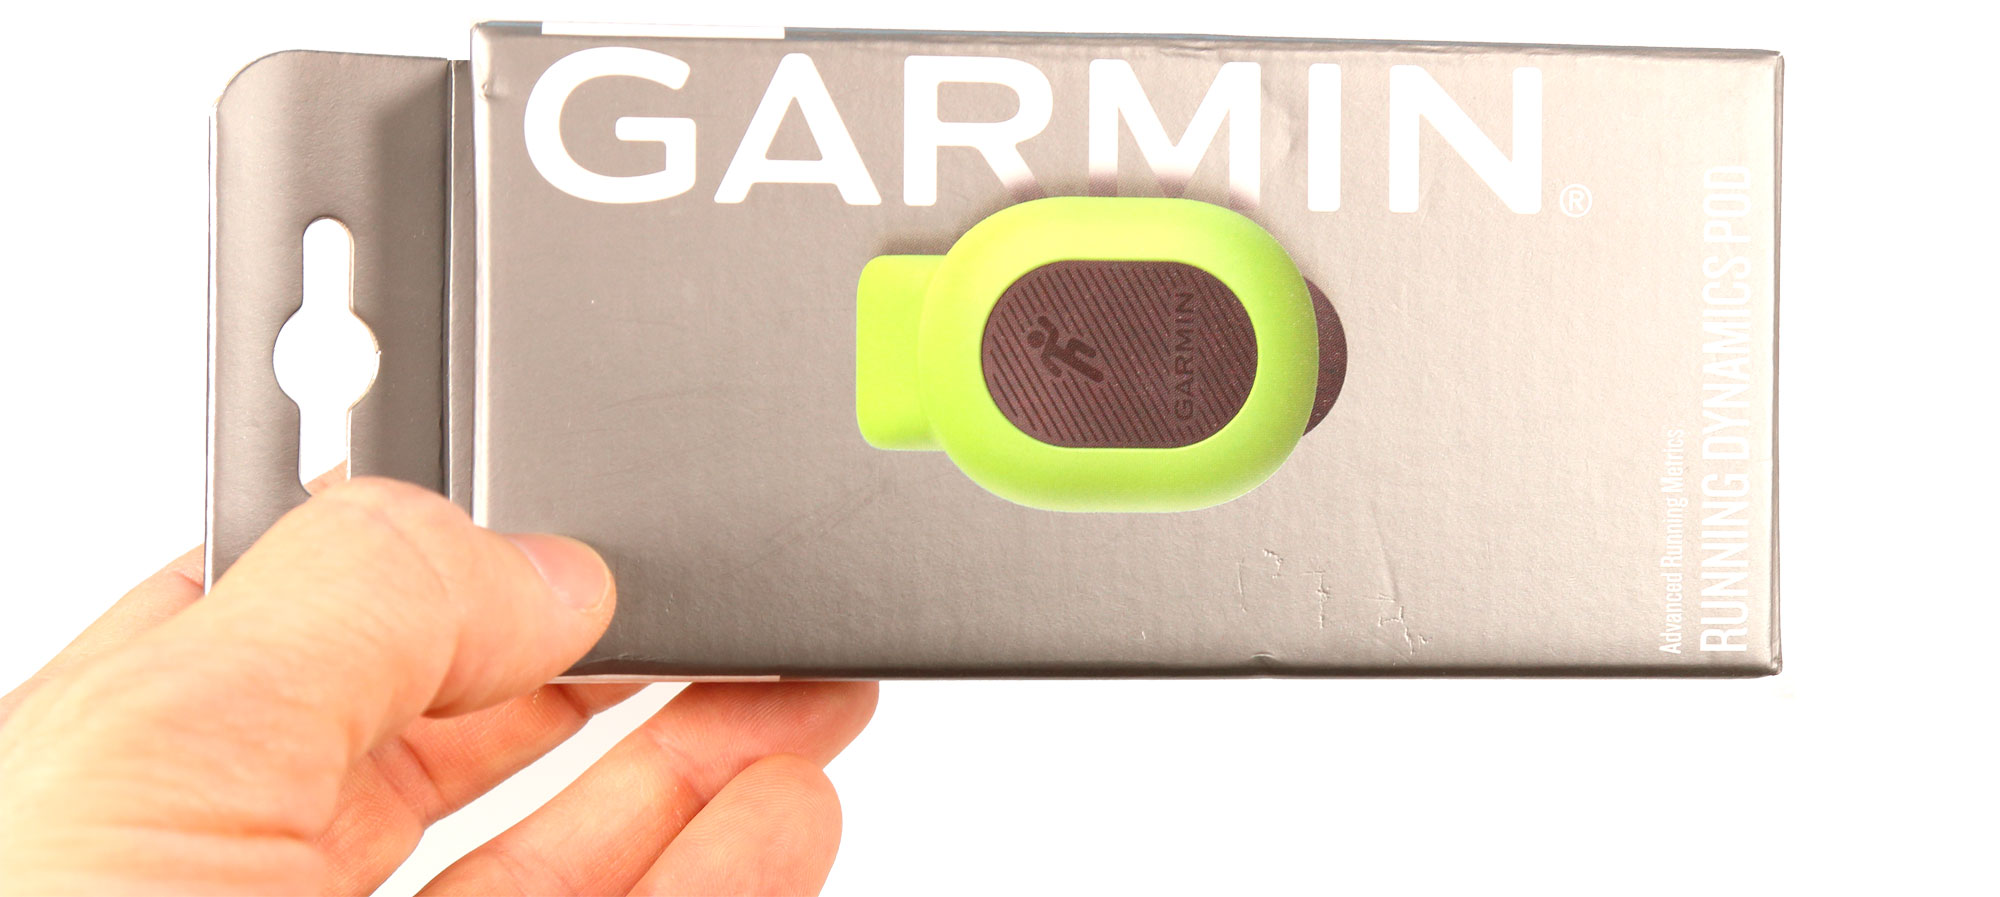 Обзор датчика для бега Garmin Running Dynamics Pod (RD Pod